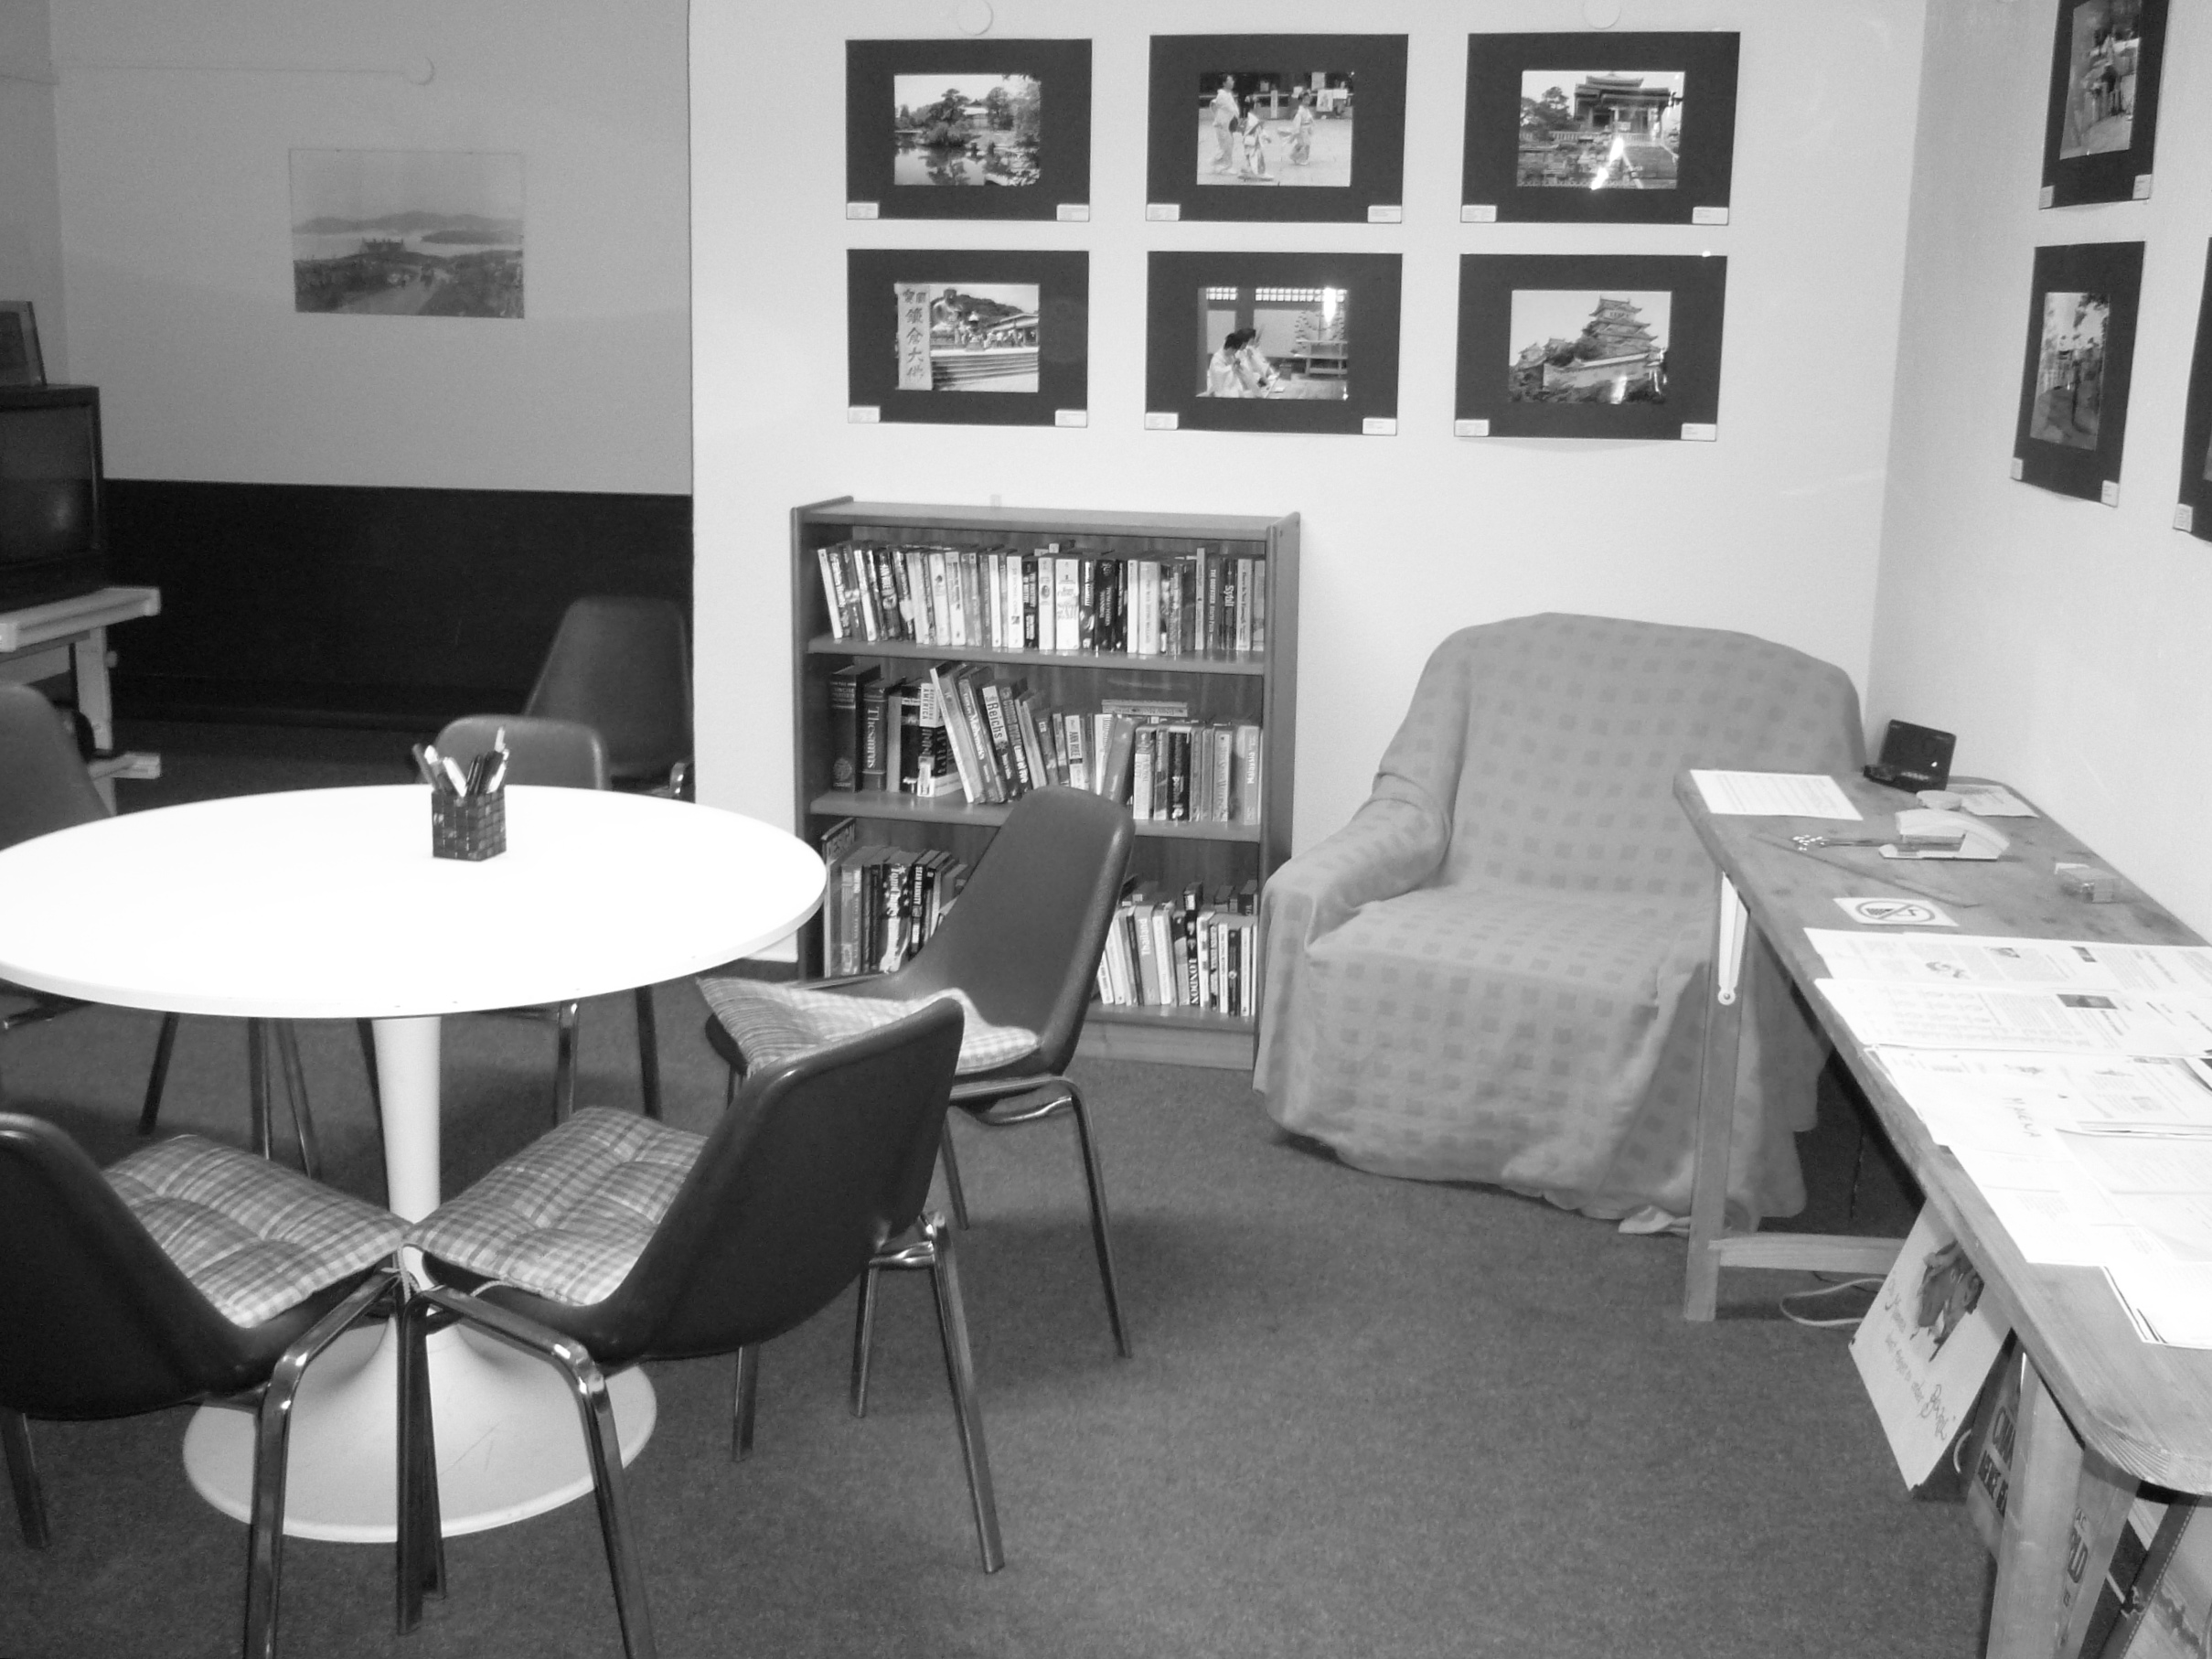 sprachkurse in k ln 39 s erster sprachbar overseas club. Black Bedroom Furniture Sets. Home Design Ideas